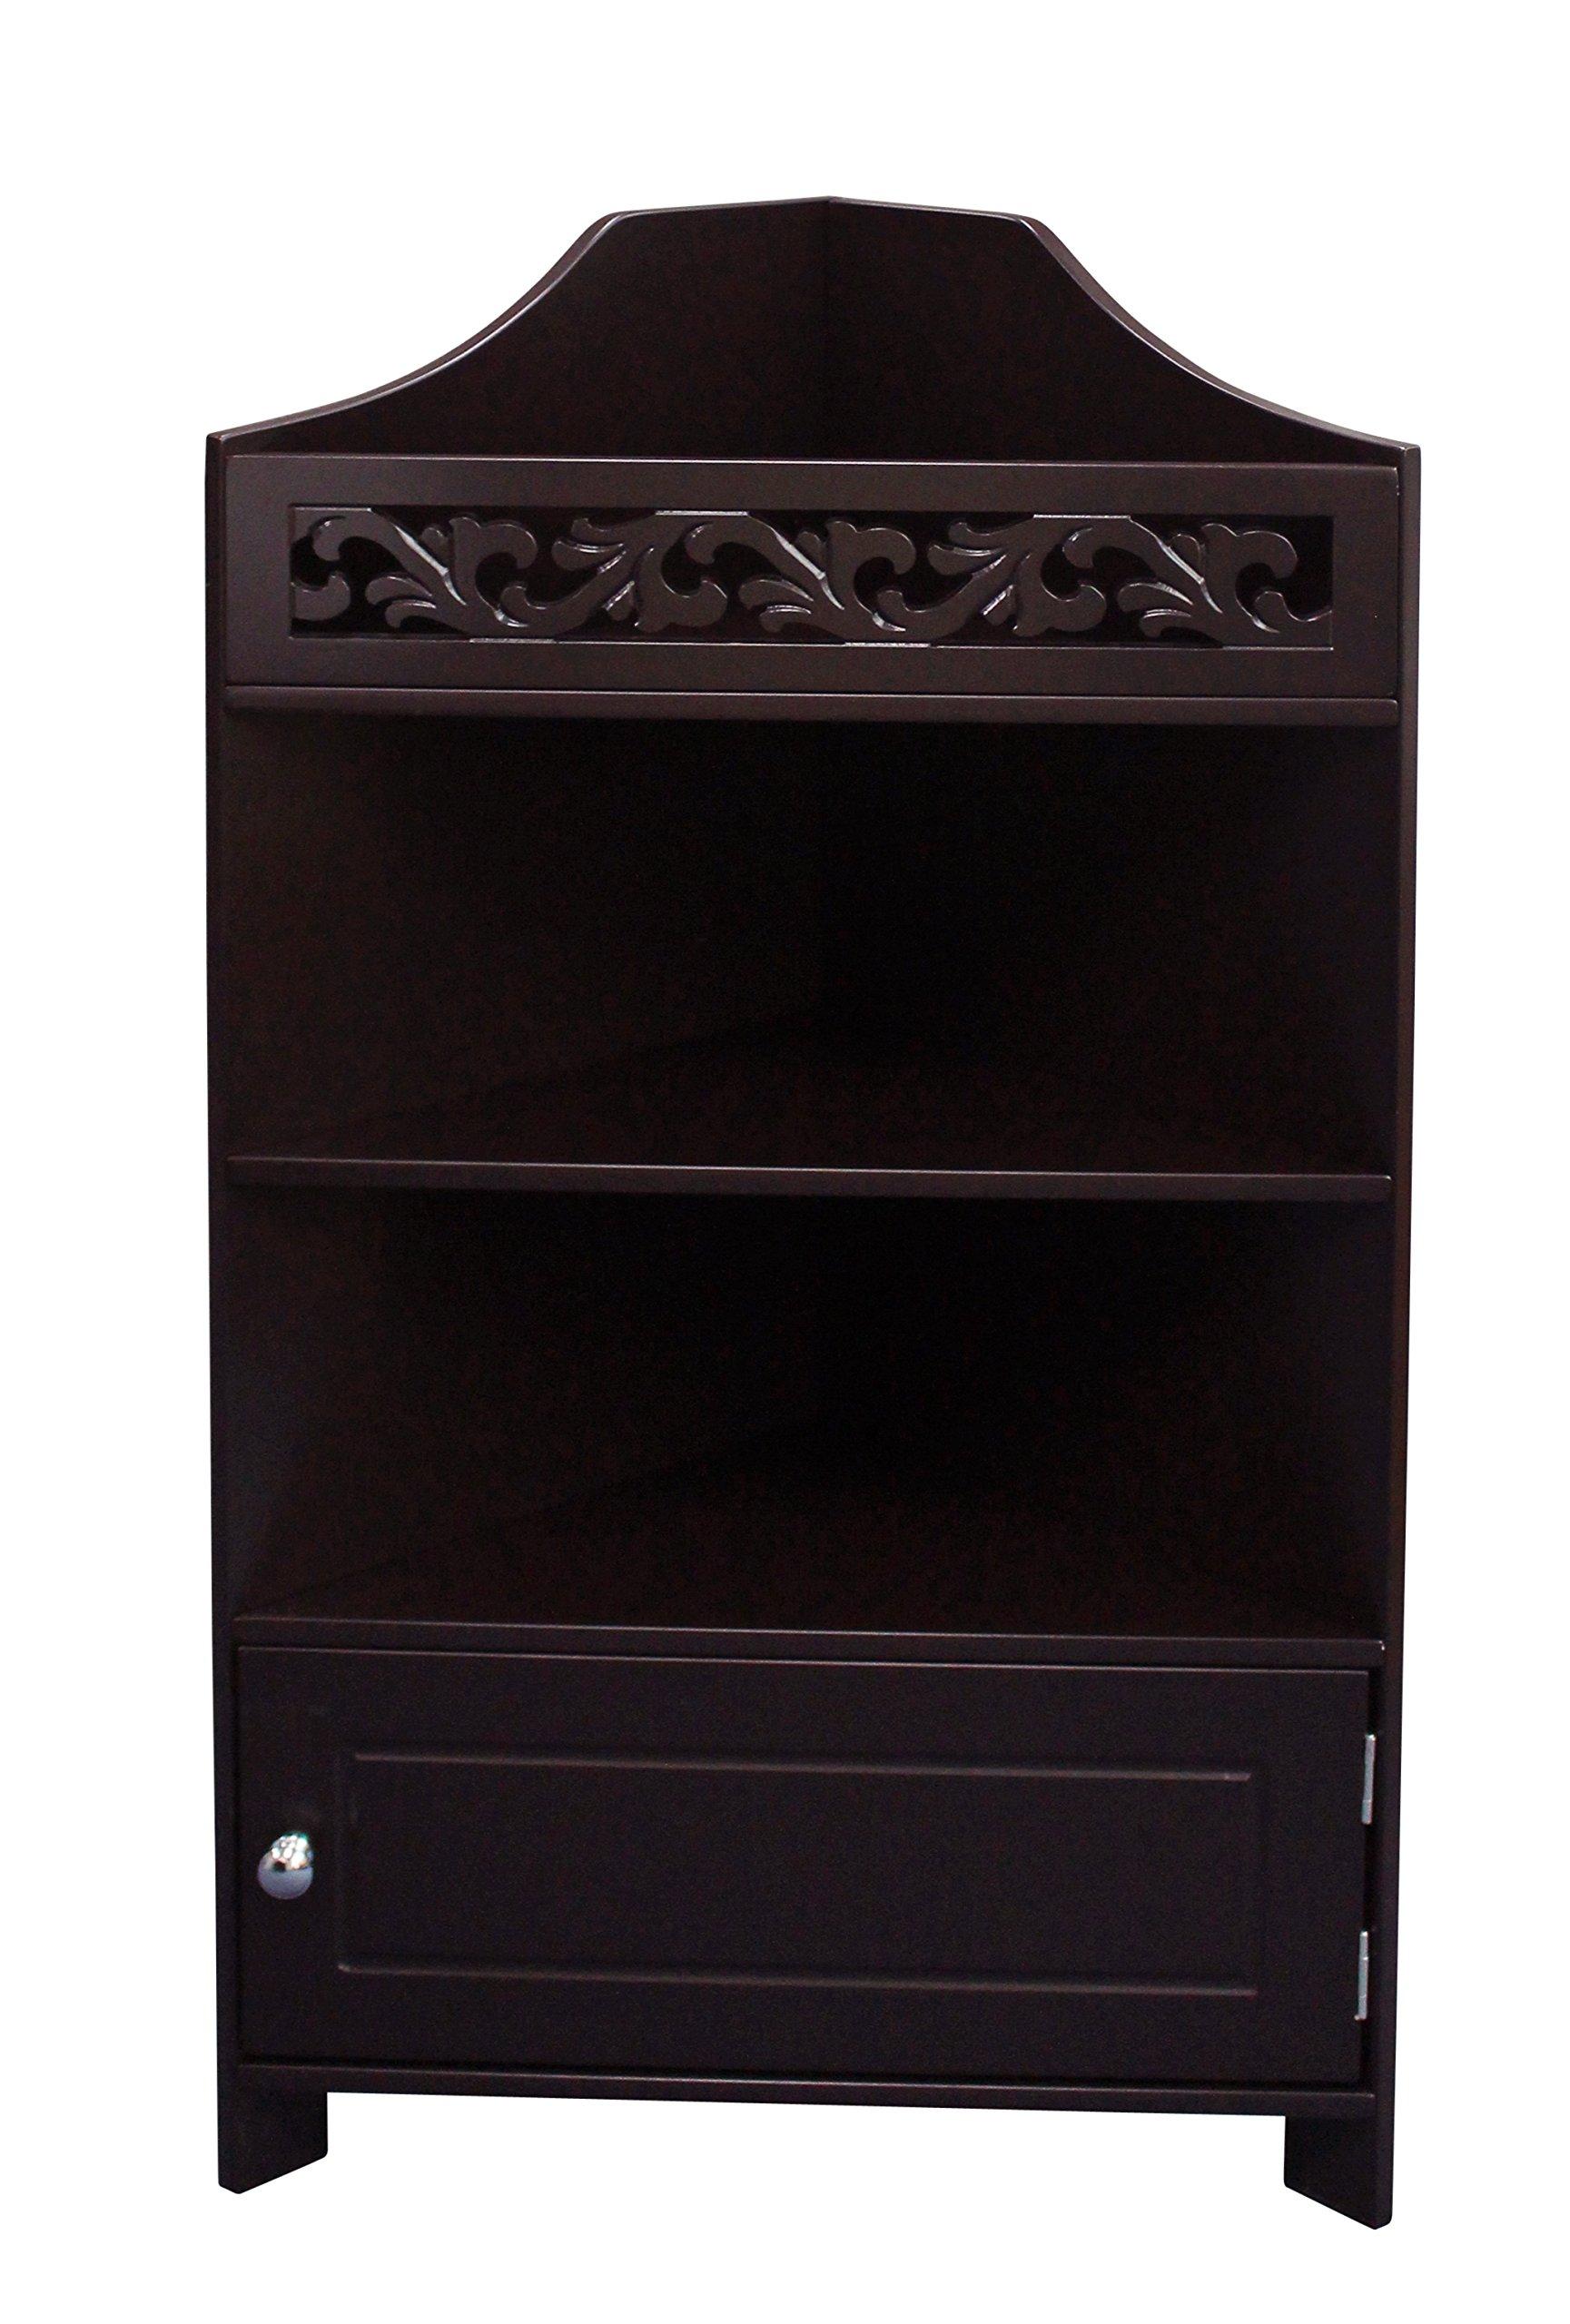 eHemco 3 Tier Corner Display,Shelf,Cabinet,Rack